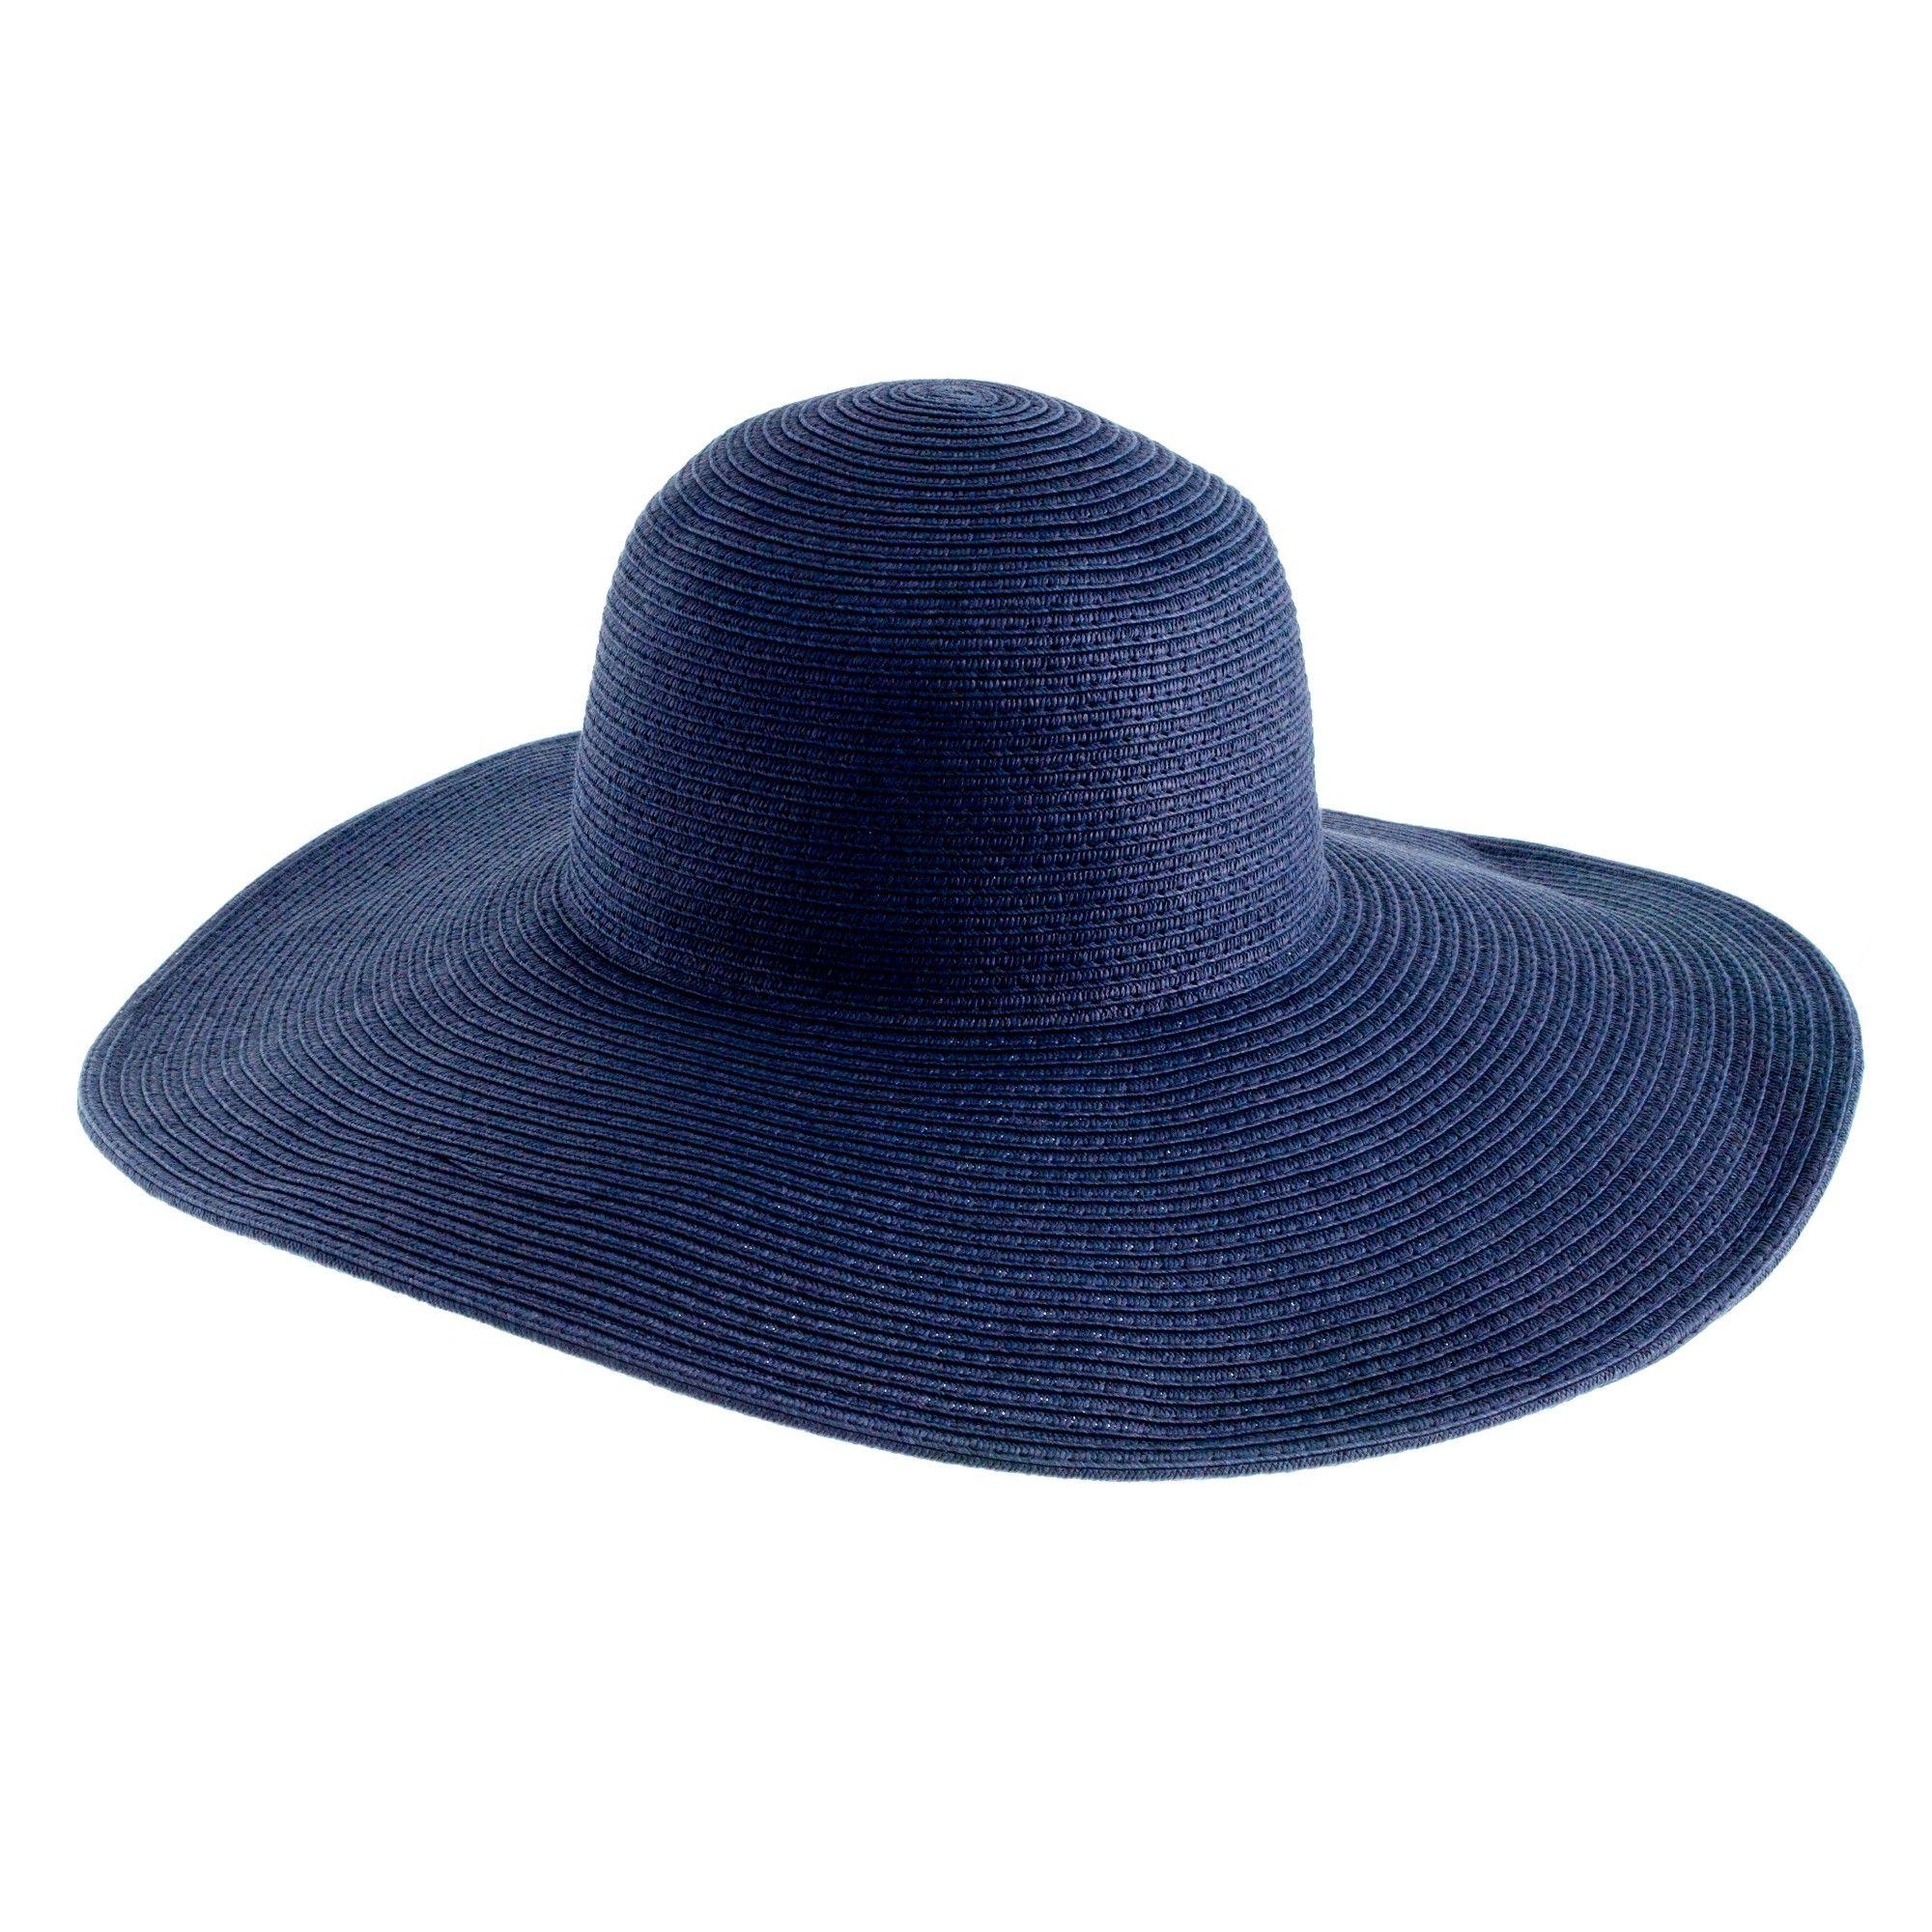 84e5f8d7bca J.crew Summer Straw Hat in Blue (navy)